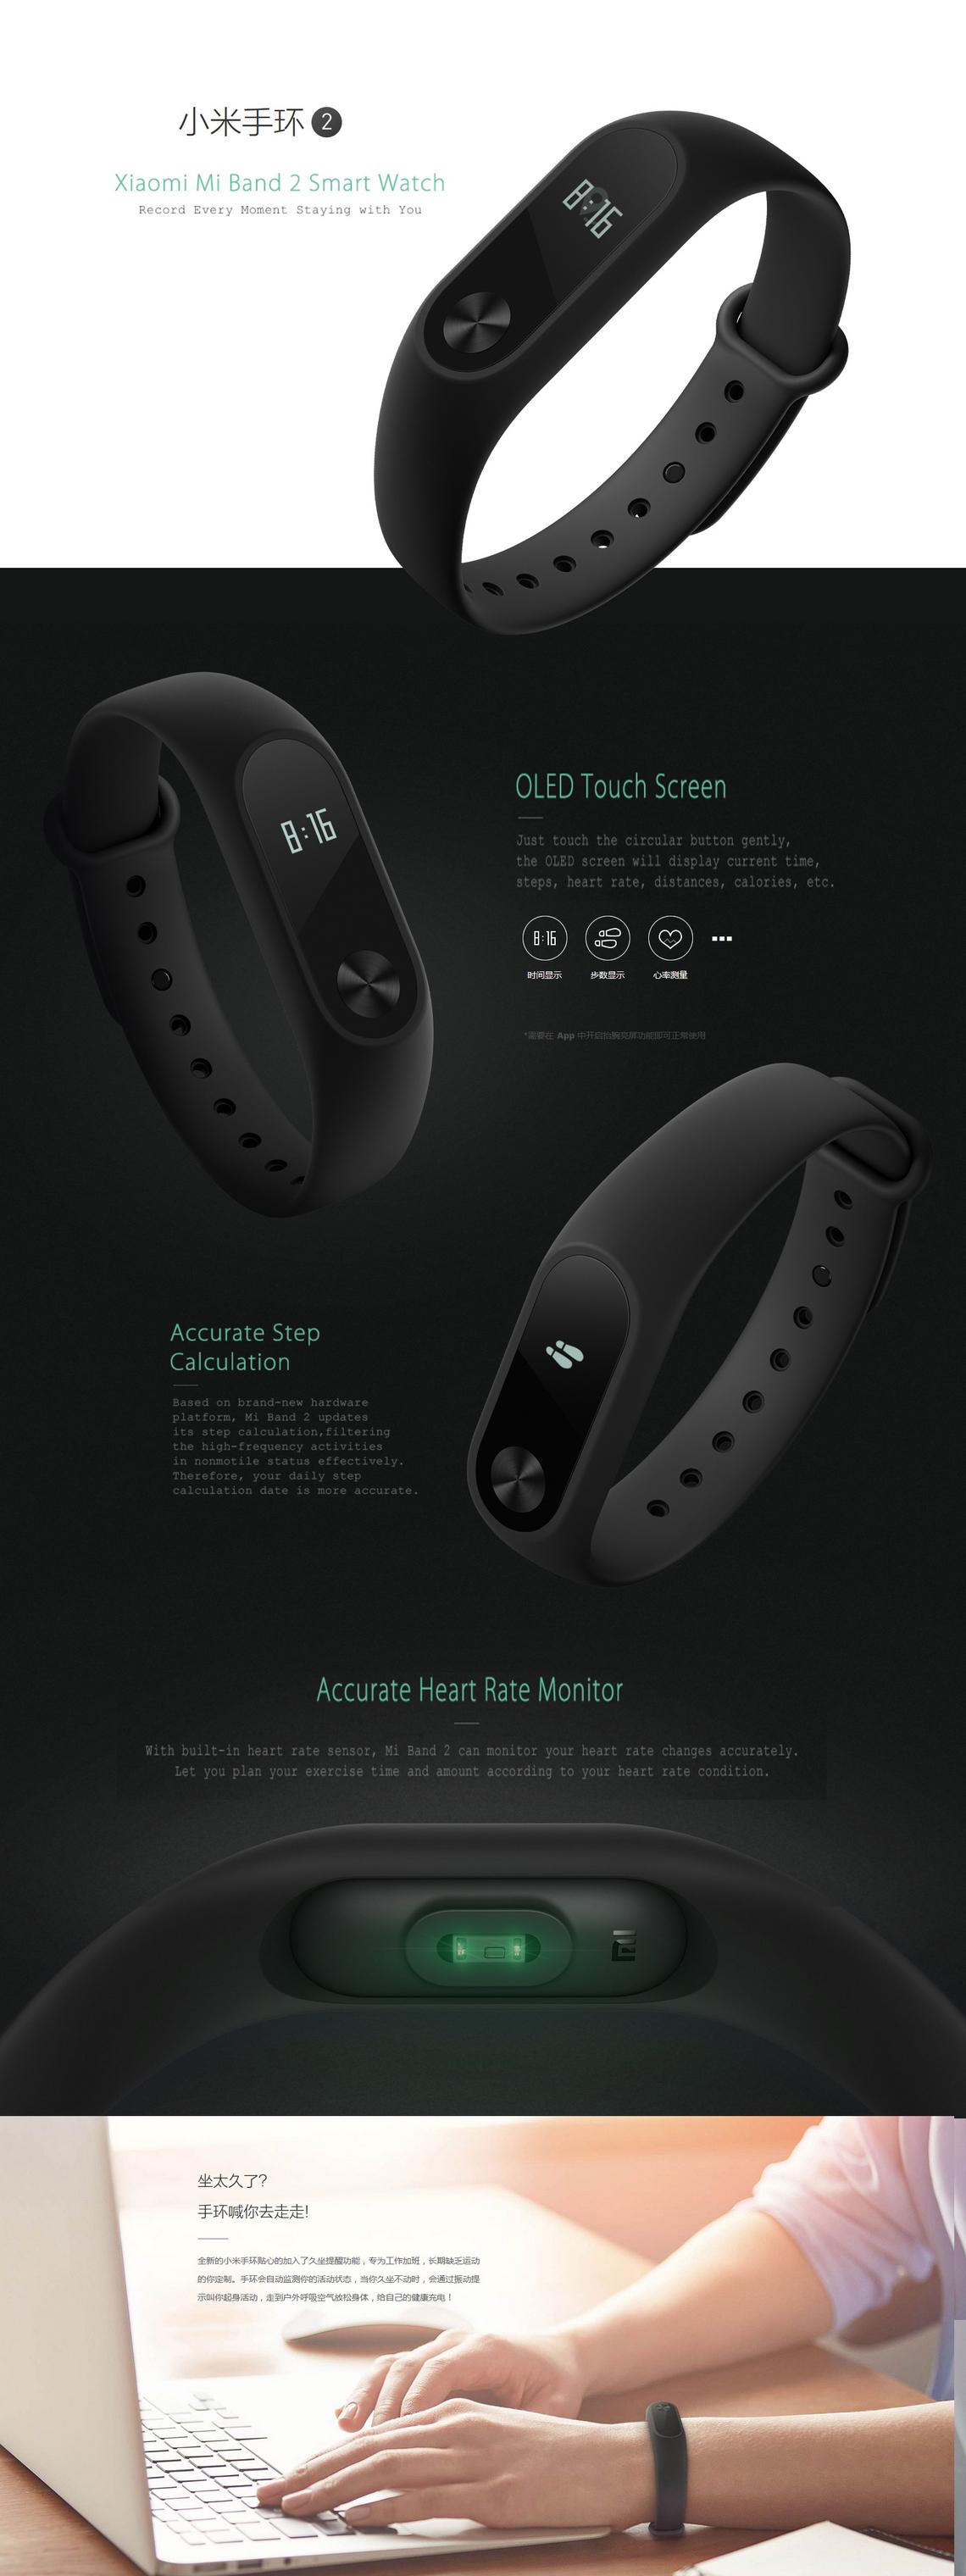 xiaomi-mi-band-2-smart-bracelet-64